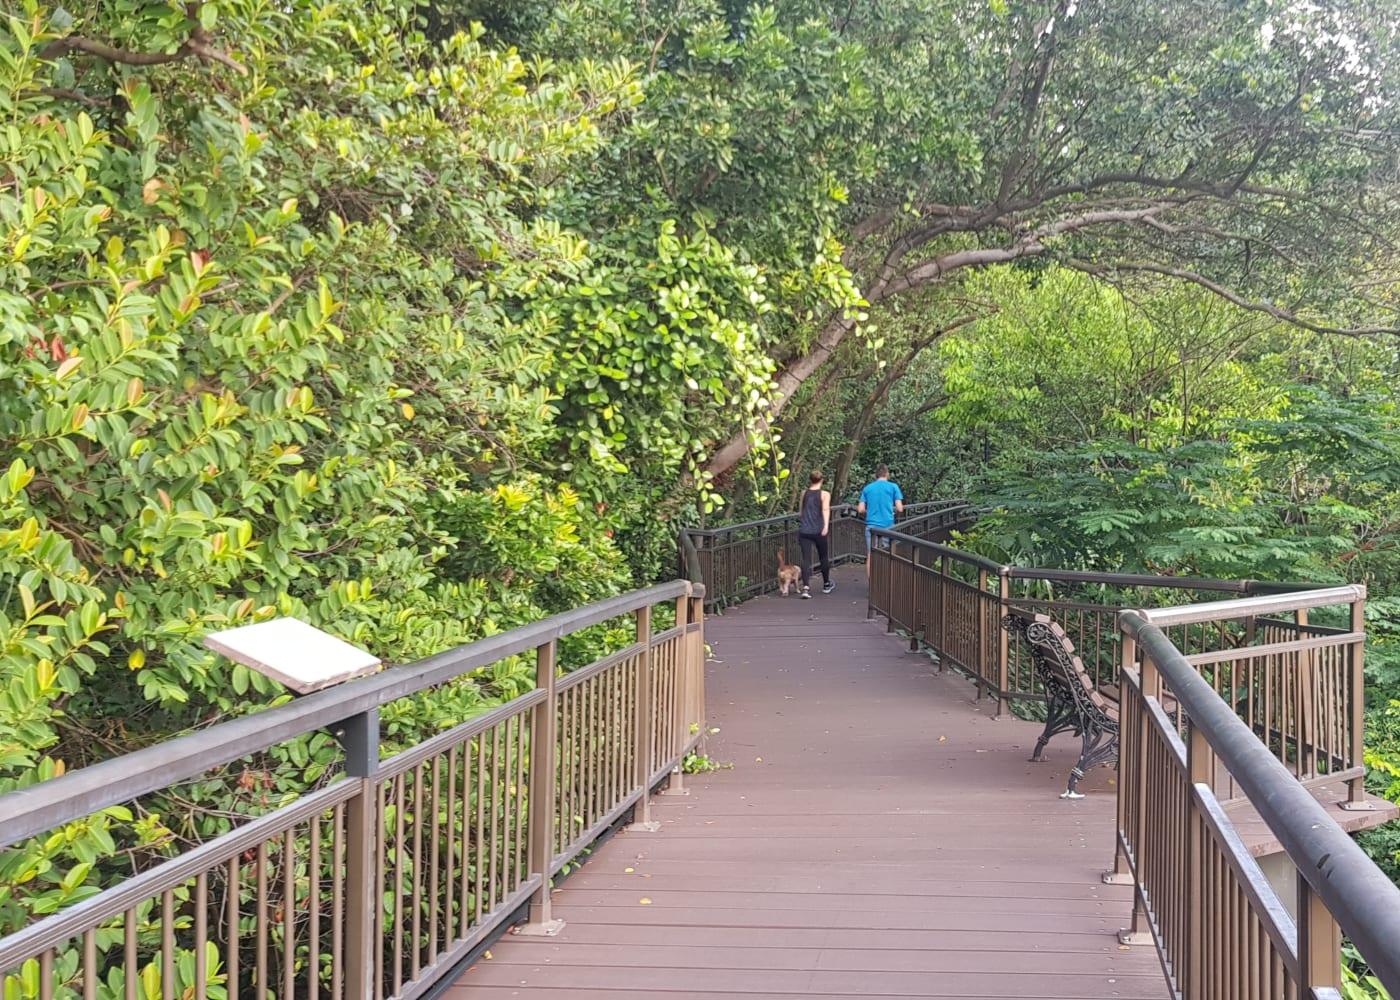 canopy walk kent ridge park